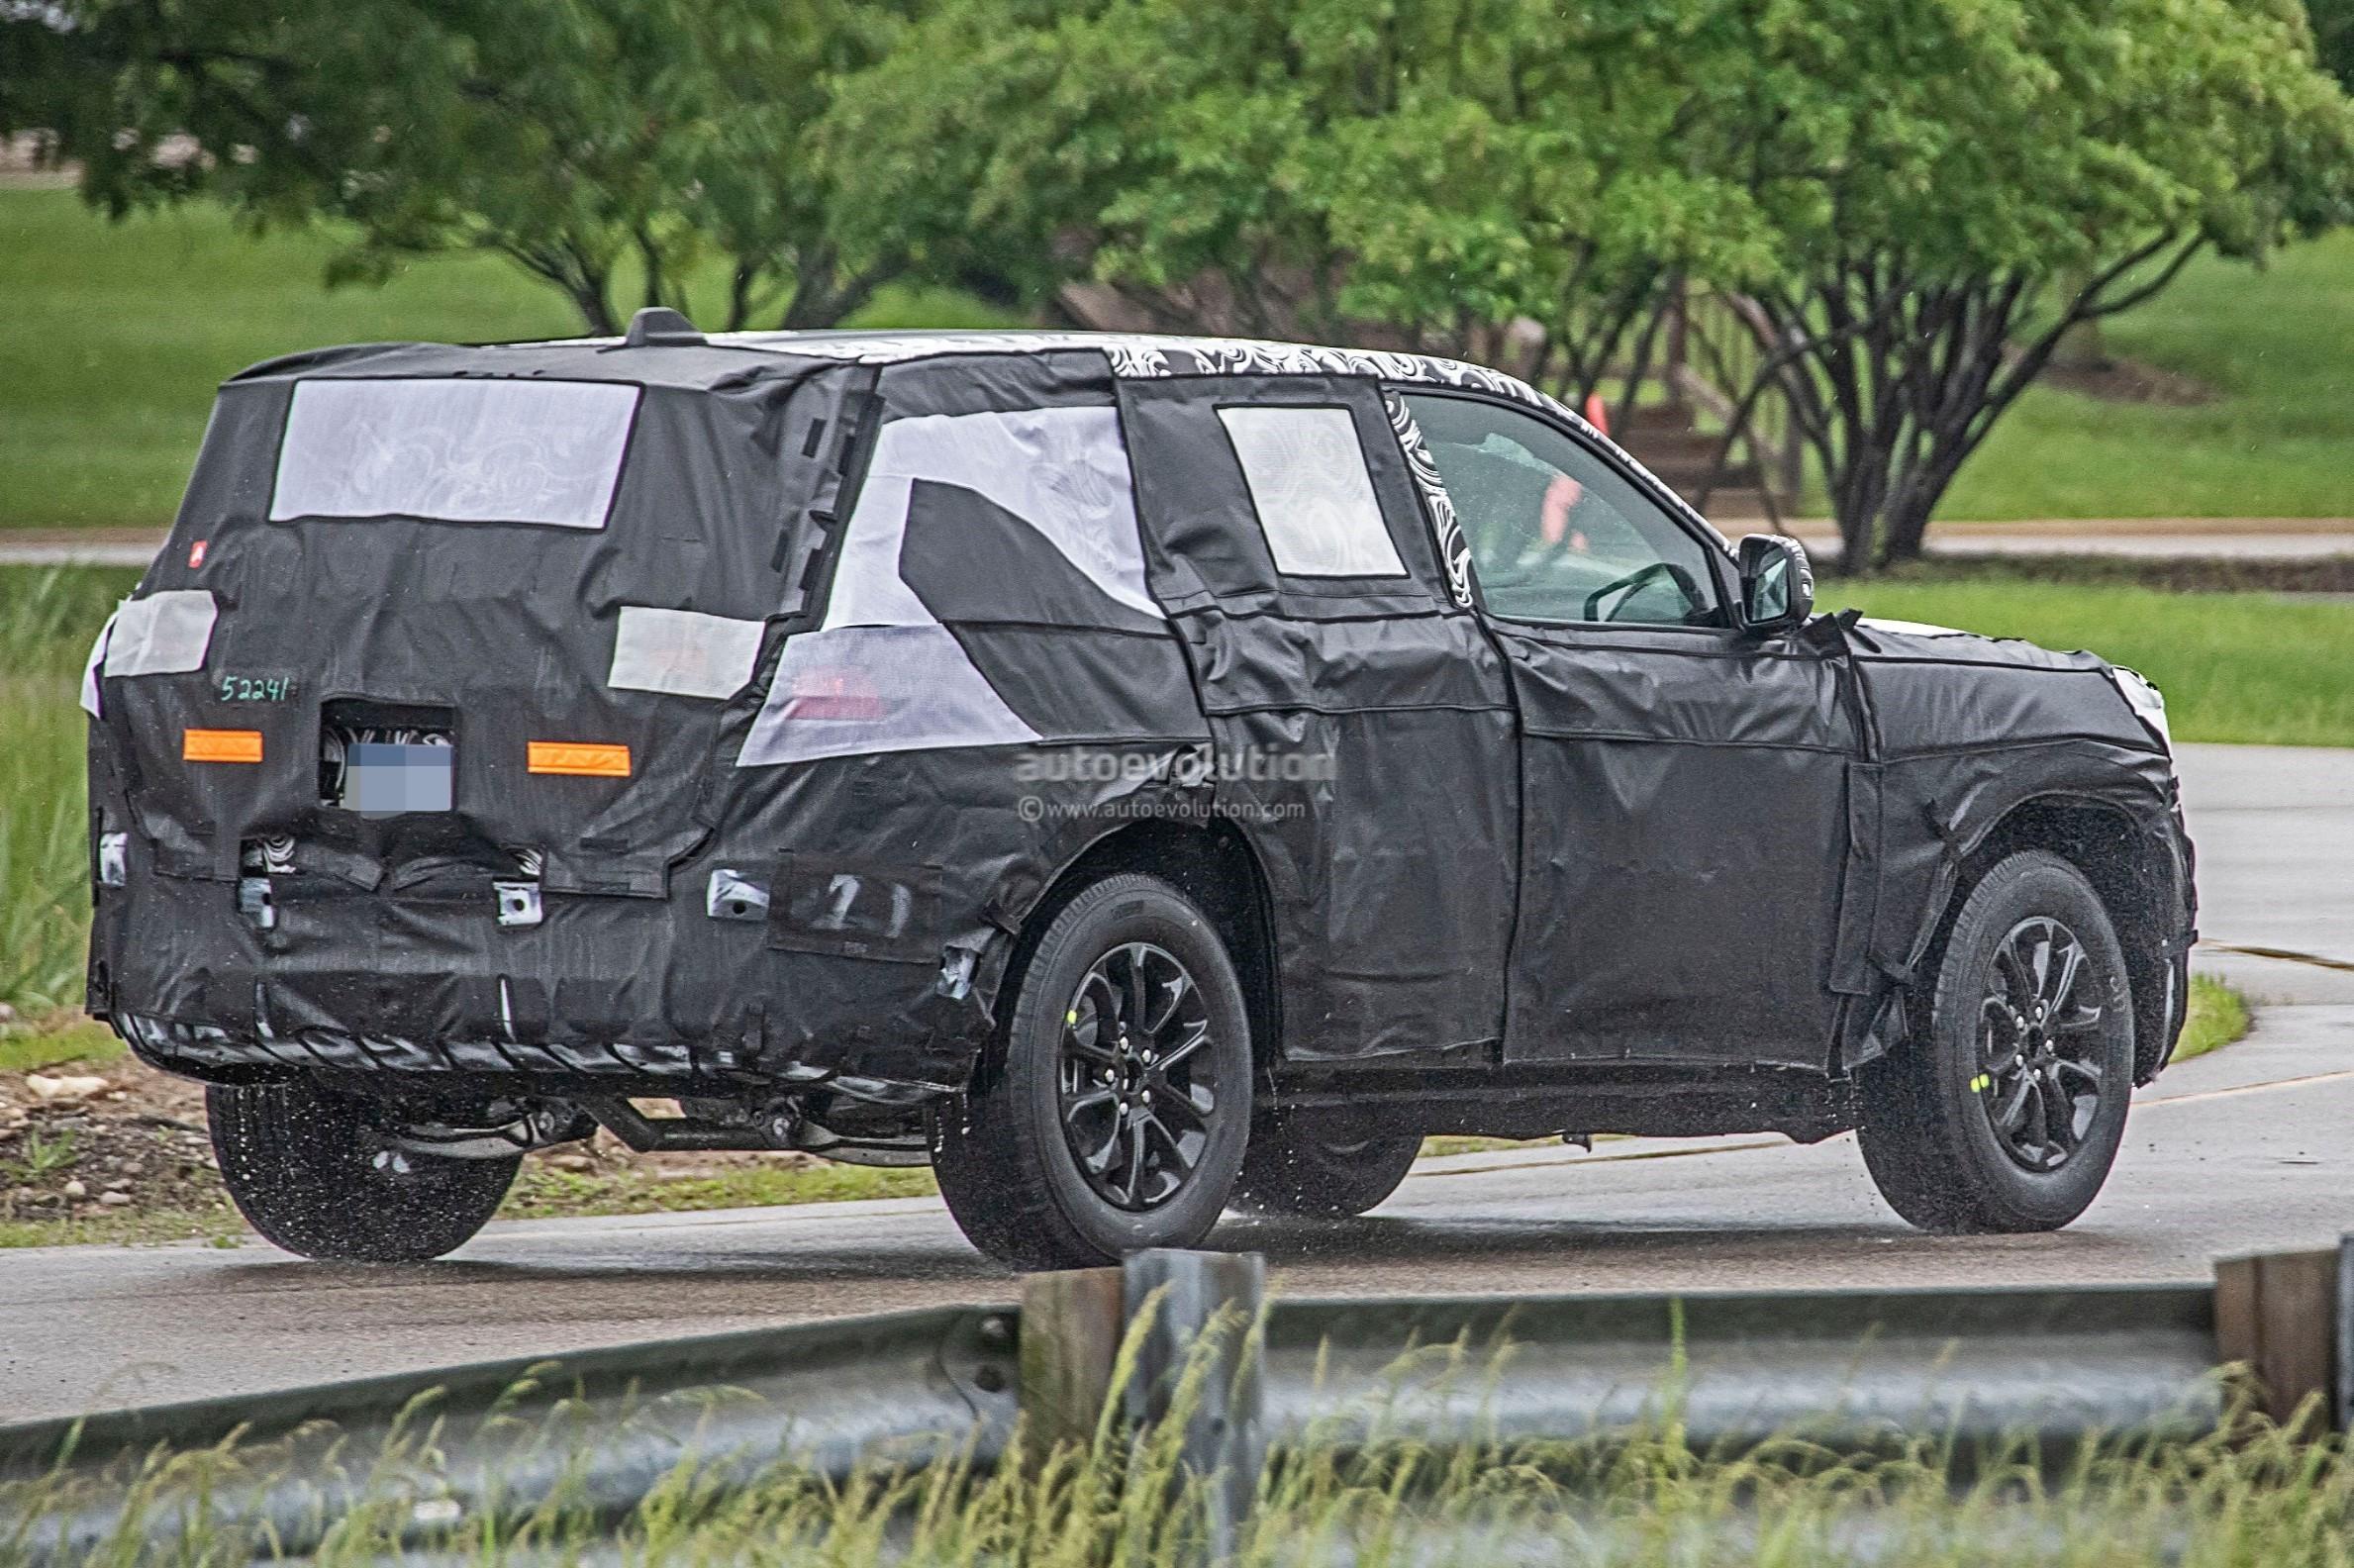 Jeep Grand Wagoneer 2018 >> 2021 Jeep Grand Cherokee (WL) Spied, Likely Rides On Alfa Romeo Giorgio Platform - autoevolution